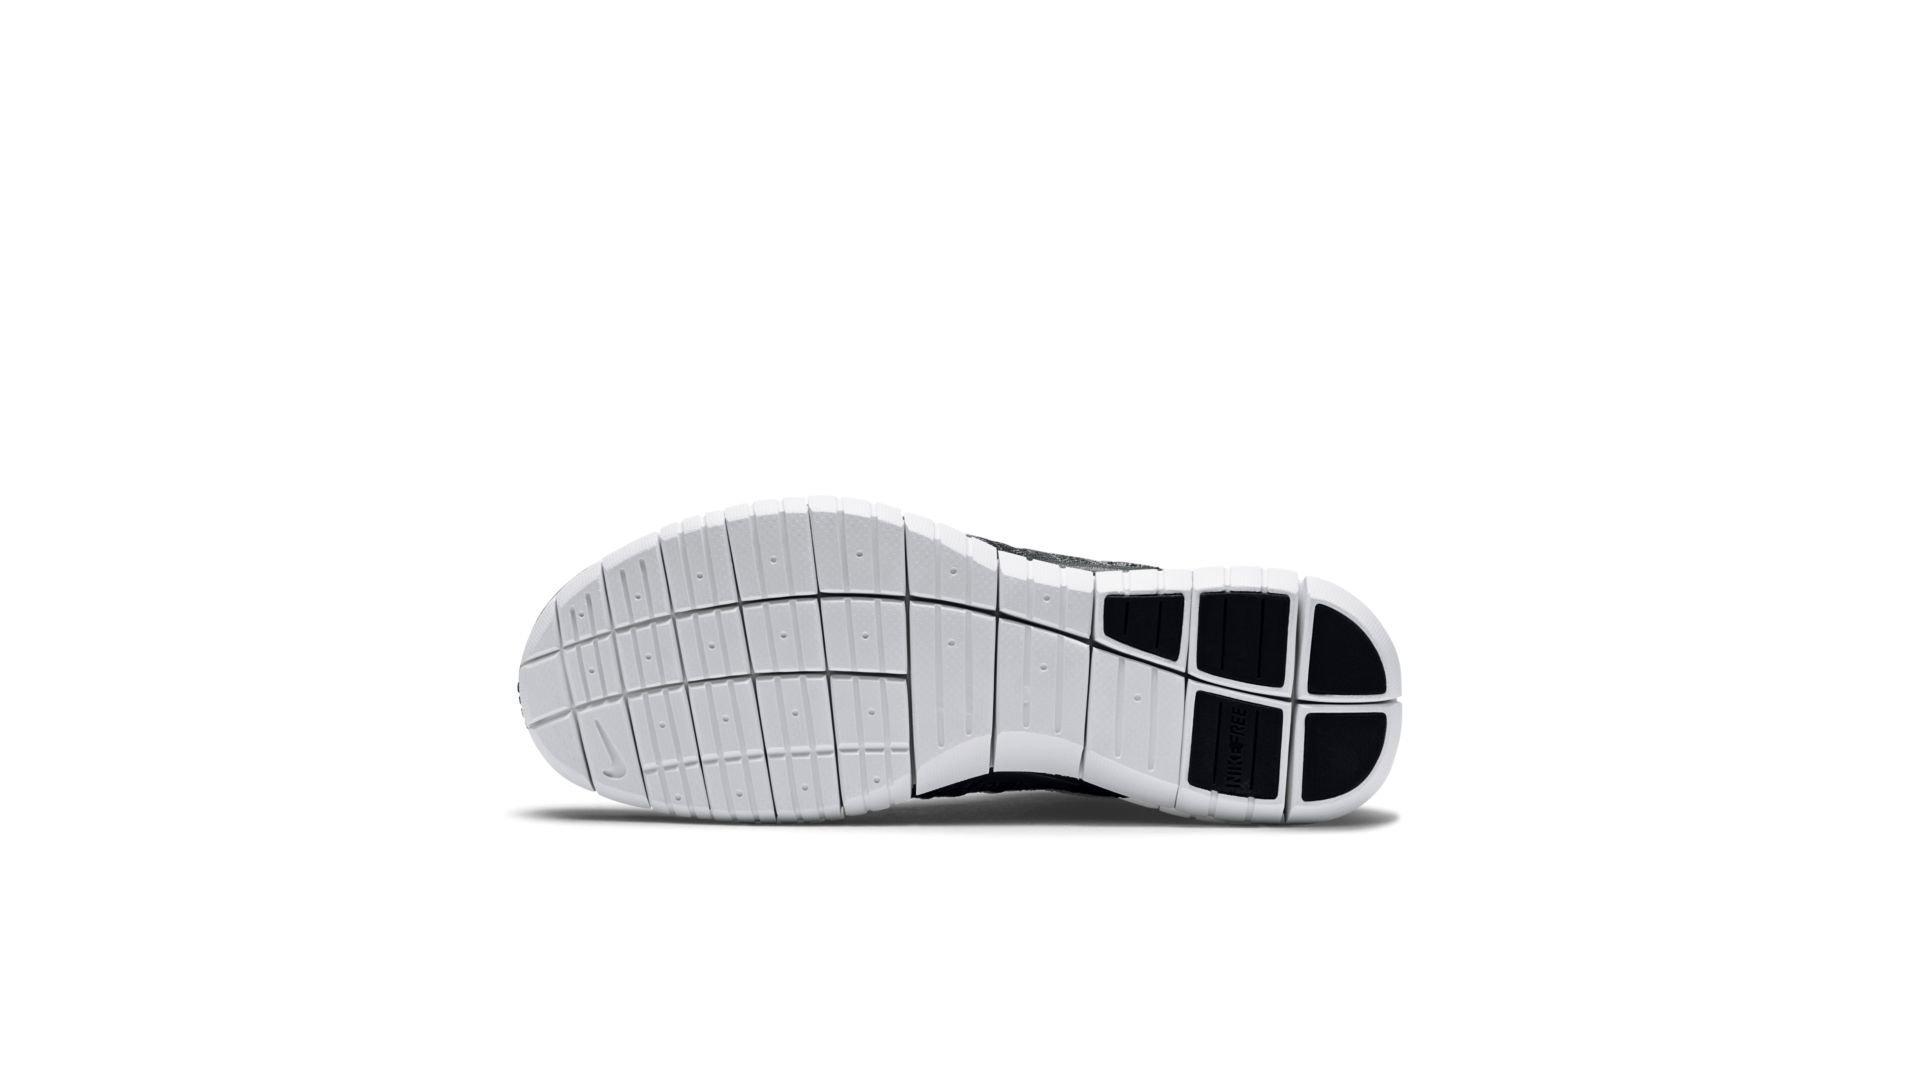 Nike Free Flyknit Chukka Midnight Fog Mica Green (639700-003)